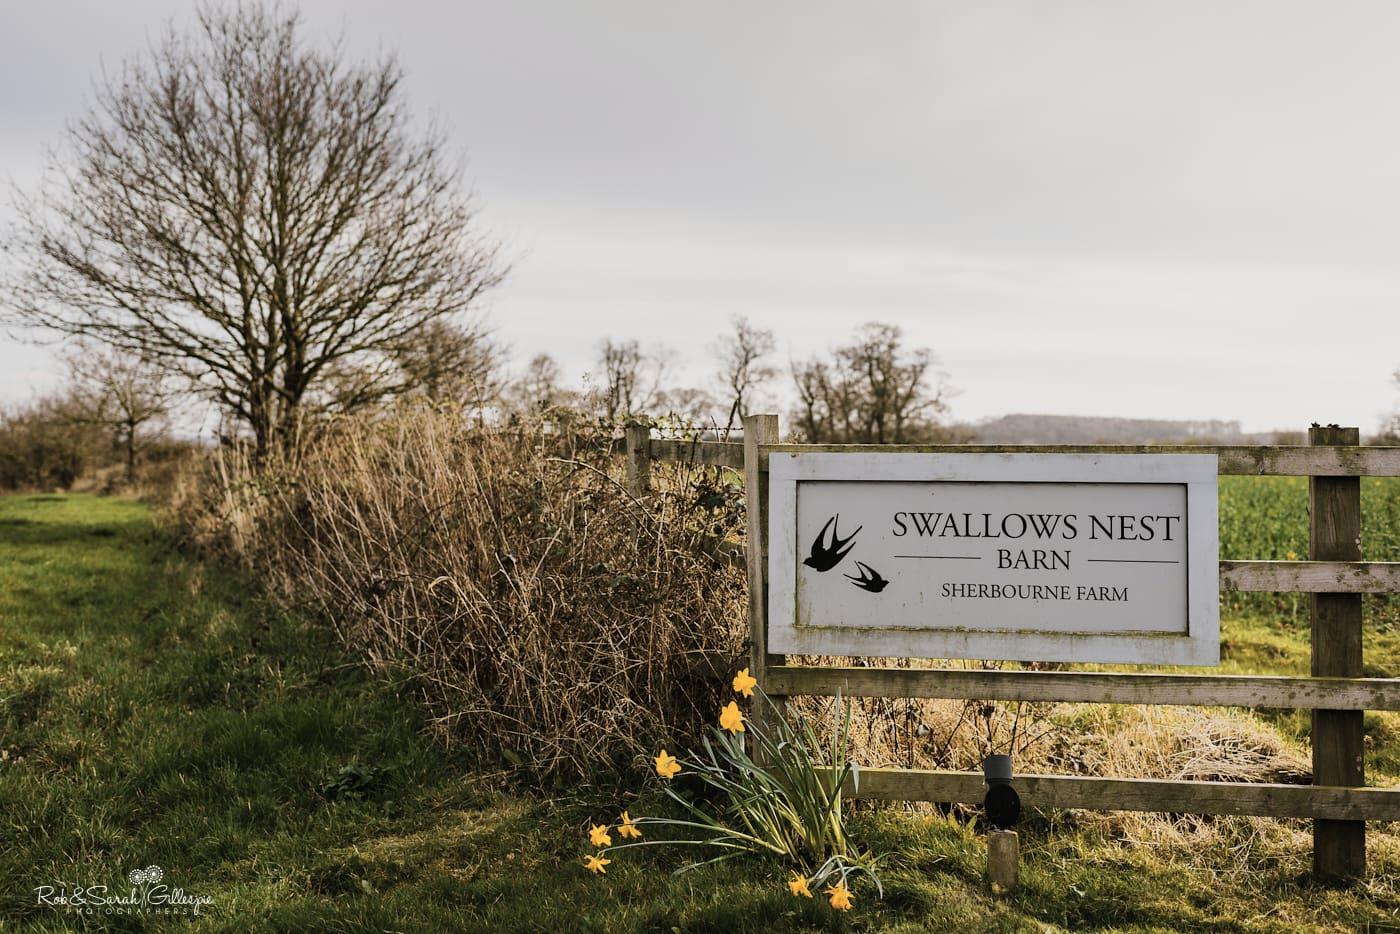 Entrance sigh for Swallows Nest Barn wedding venue